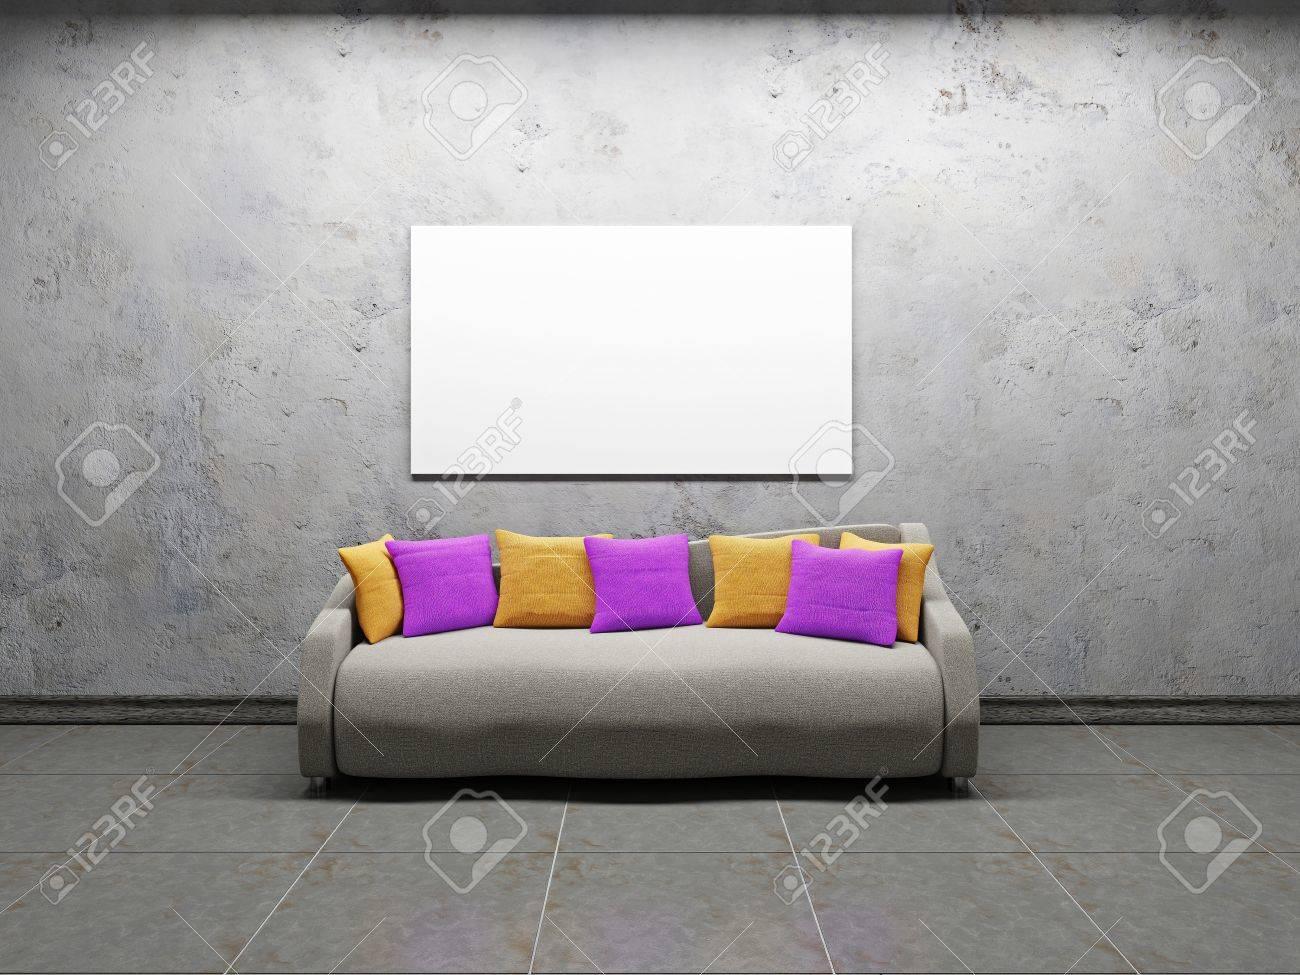 Sofa with pillows near the concrete wall Stock Photo - 22087294